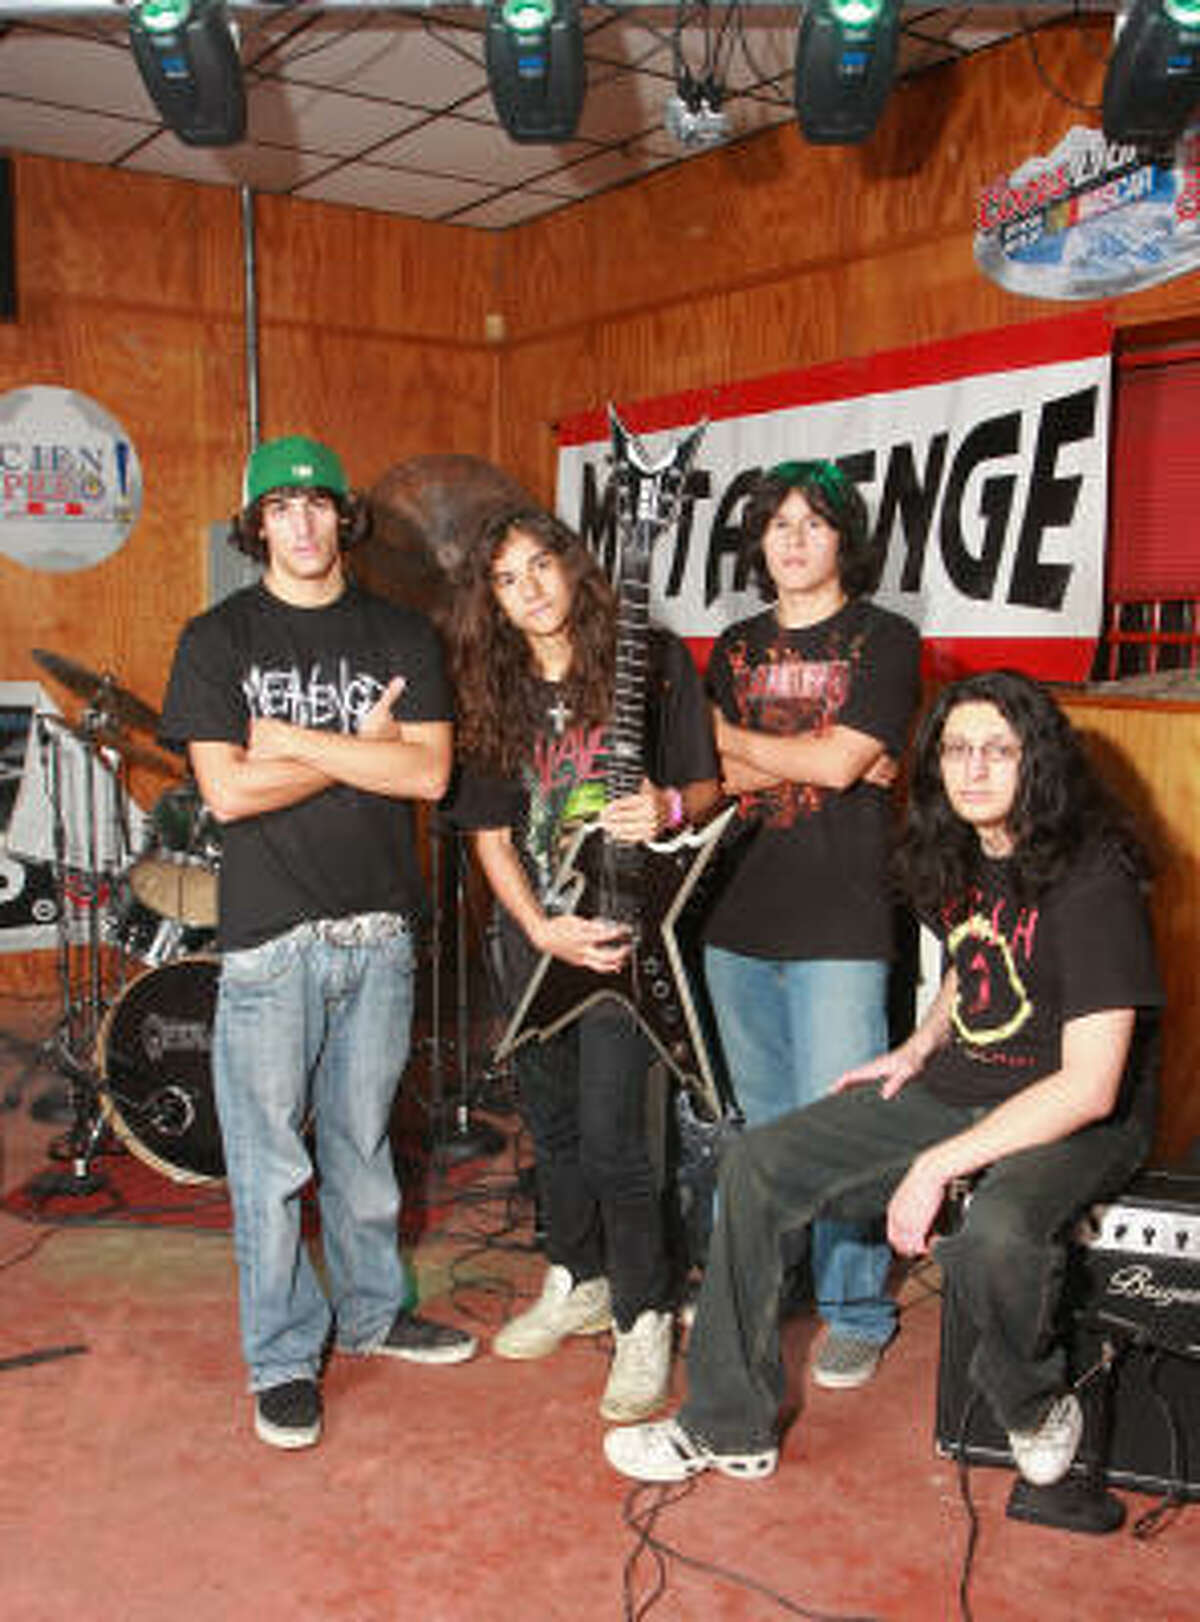 Members of Metavenge, lead guitarist Tony Bastida, from left, lead vocals and guitar Anthony Cruz, drummer Brandon Galvan, and bass guitar, Evan Bastida.